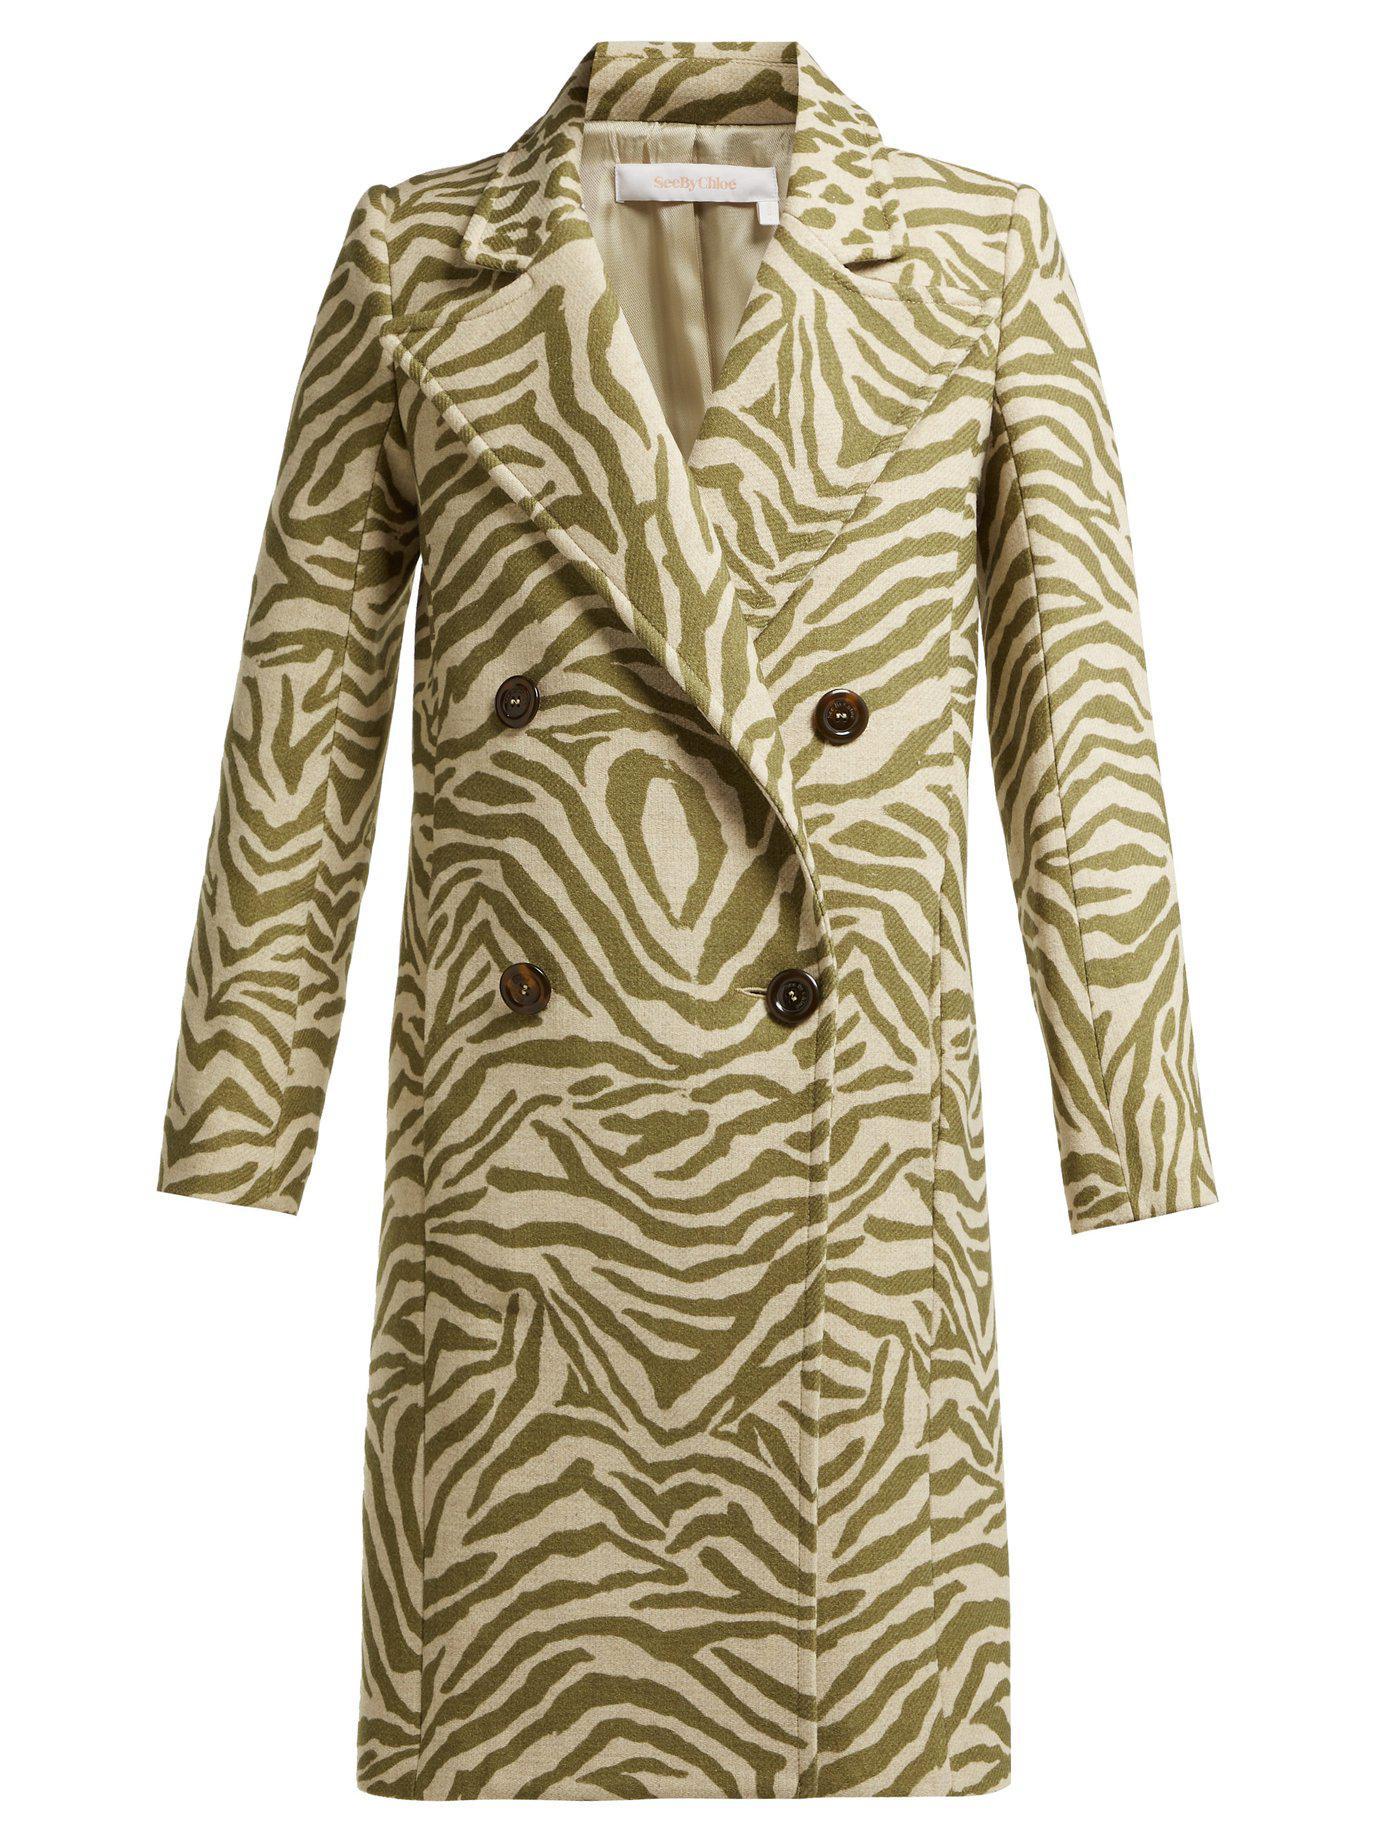 27db67c45 See By Chloé - Natural Tiger Print Wool Blend Coat - Lyst. View fullscreen